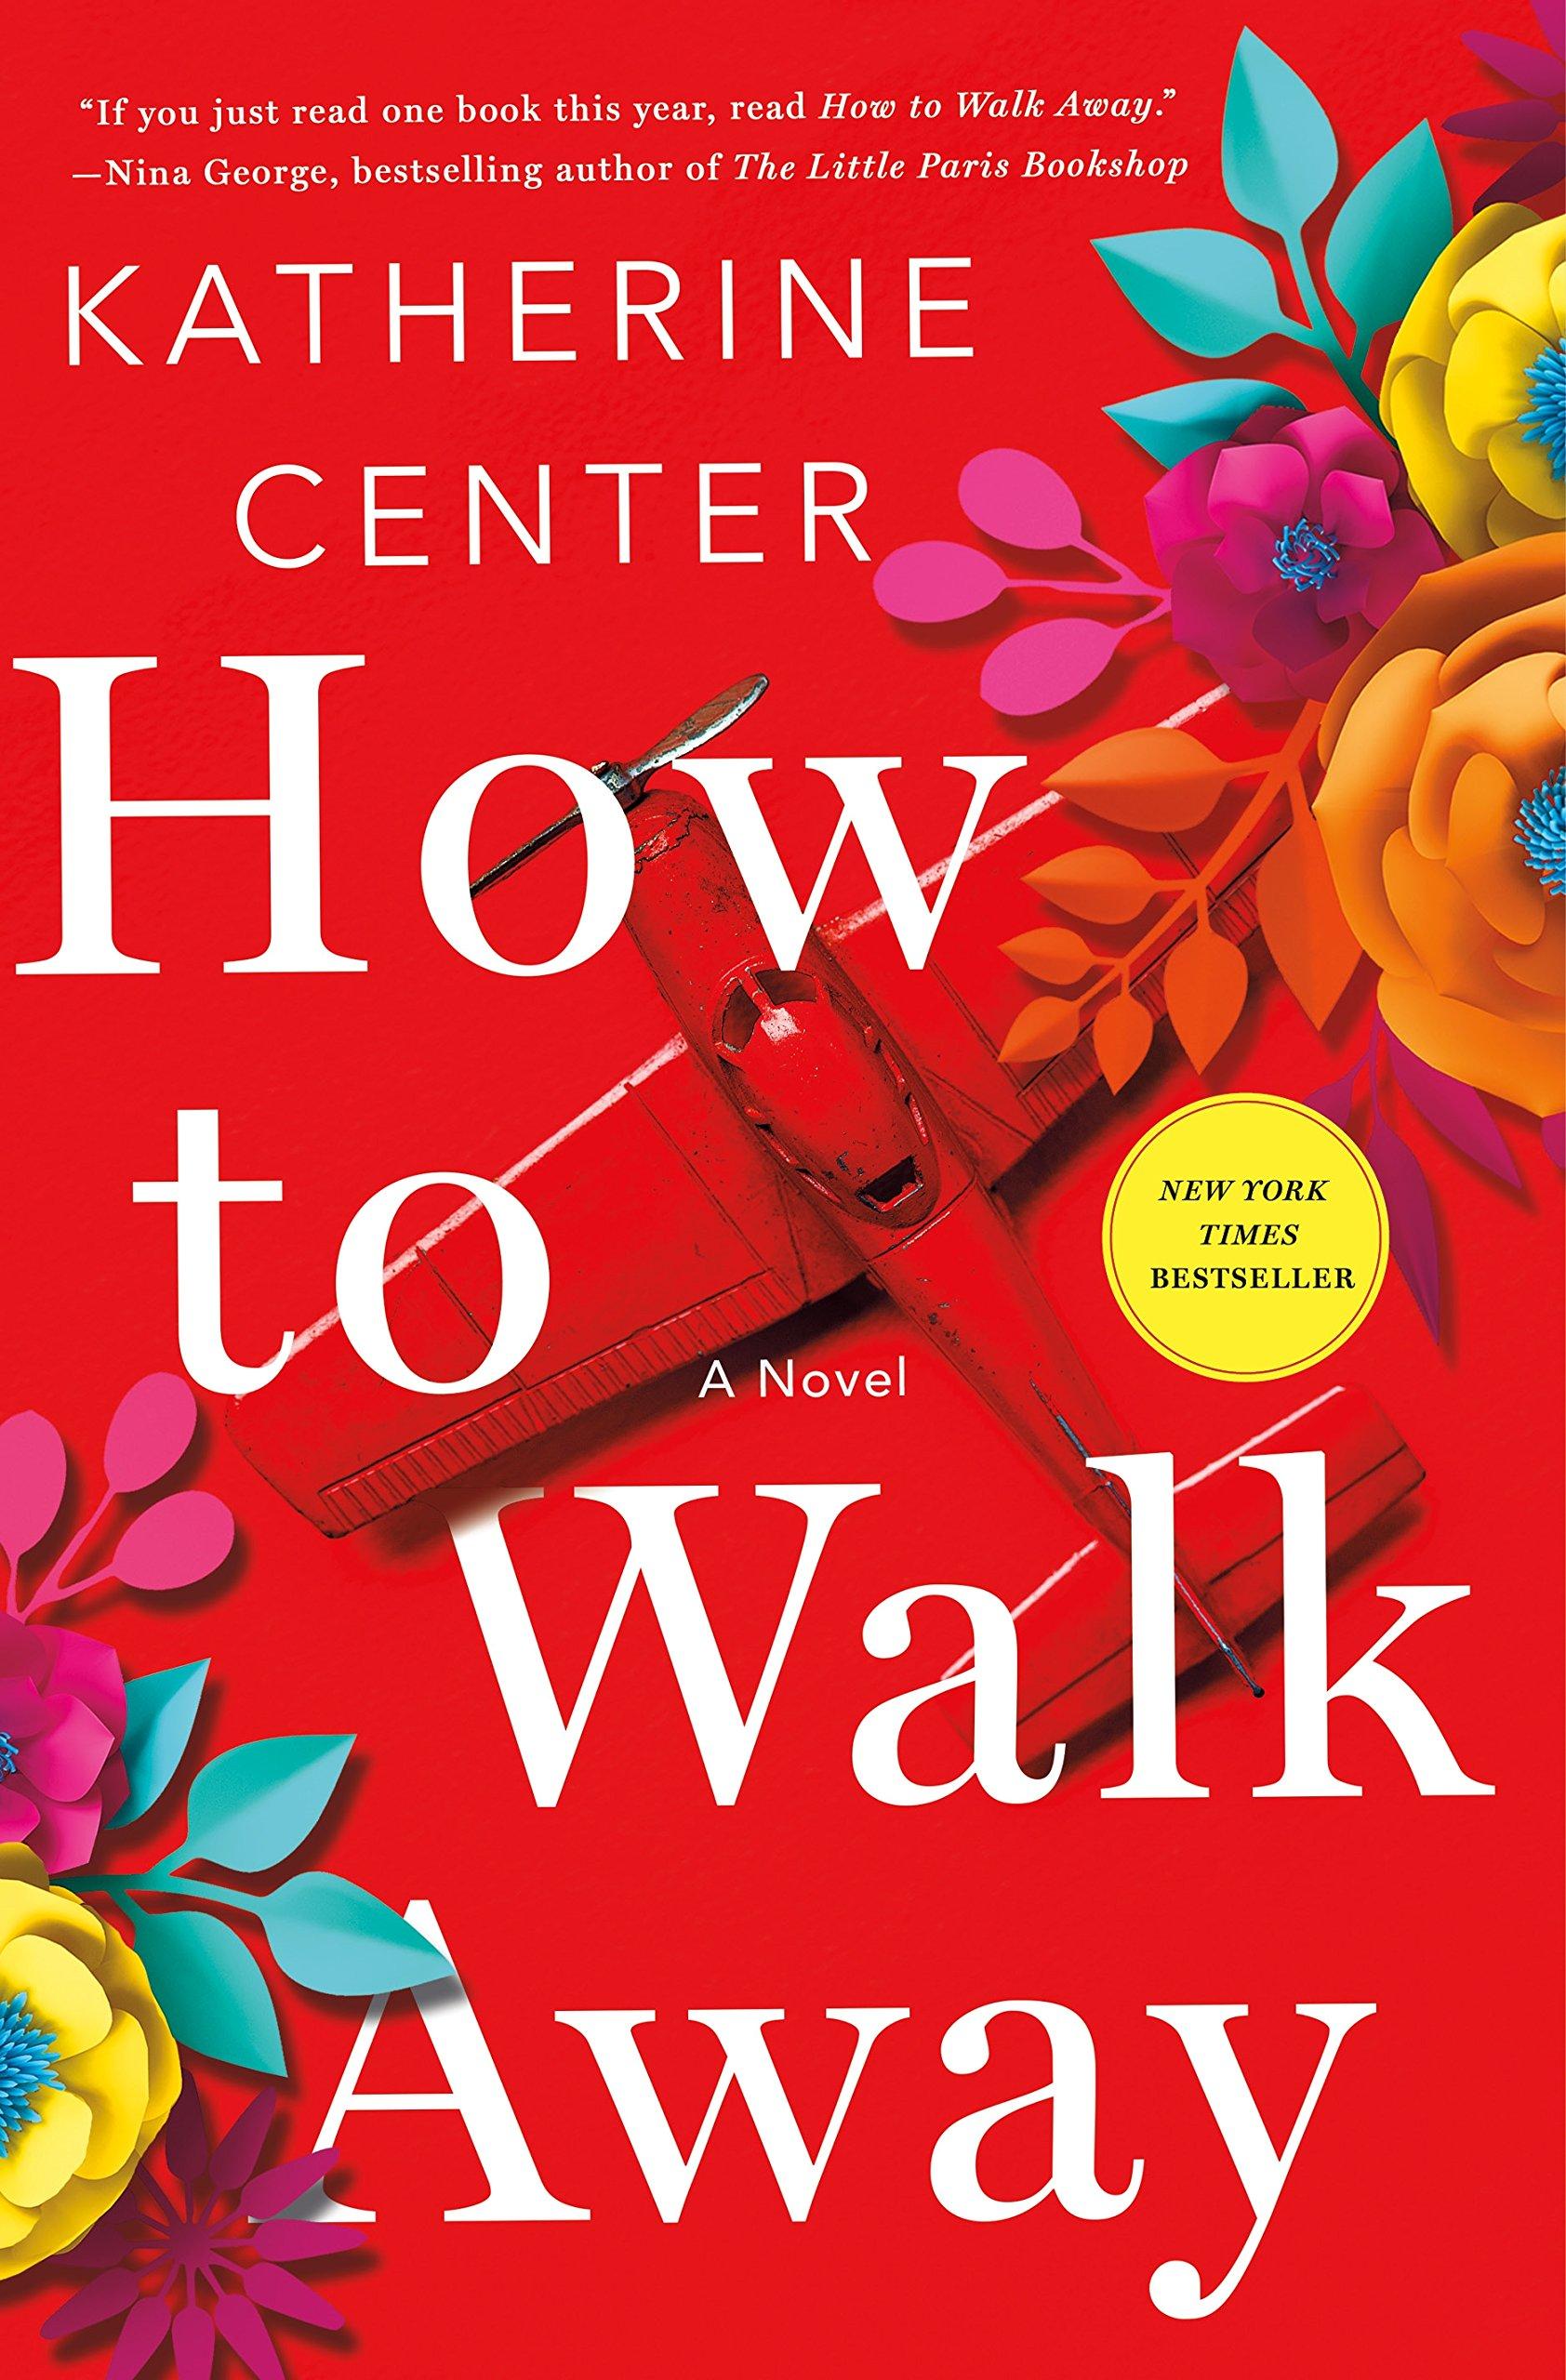 How to Walk Away